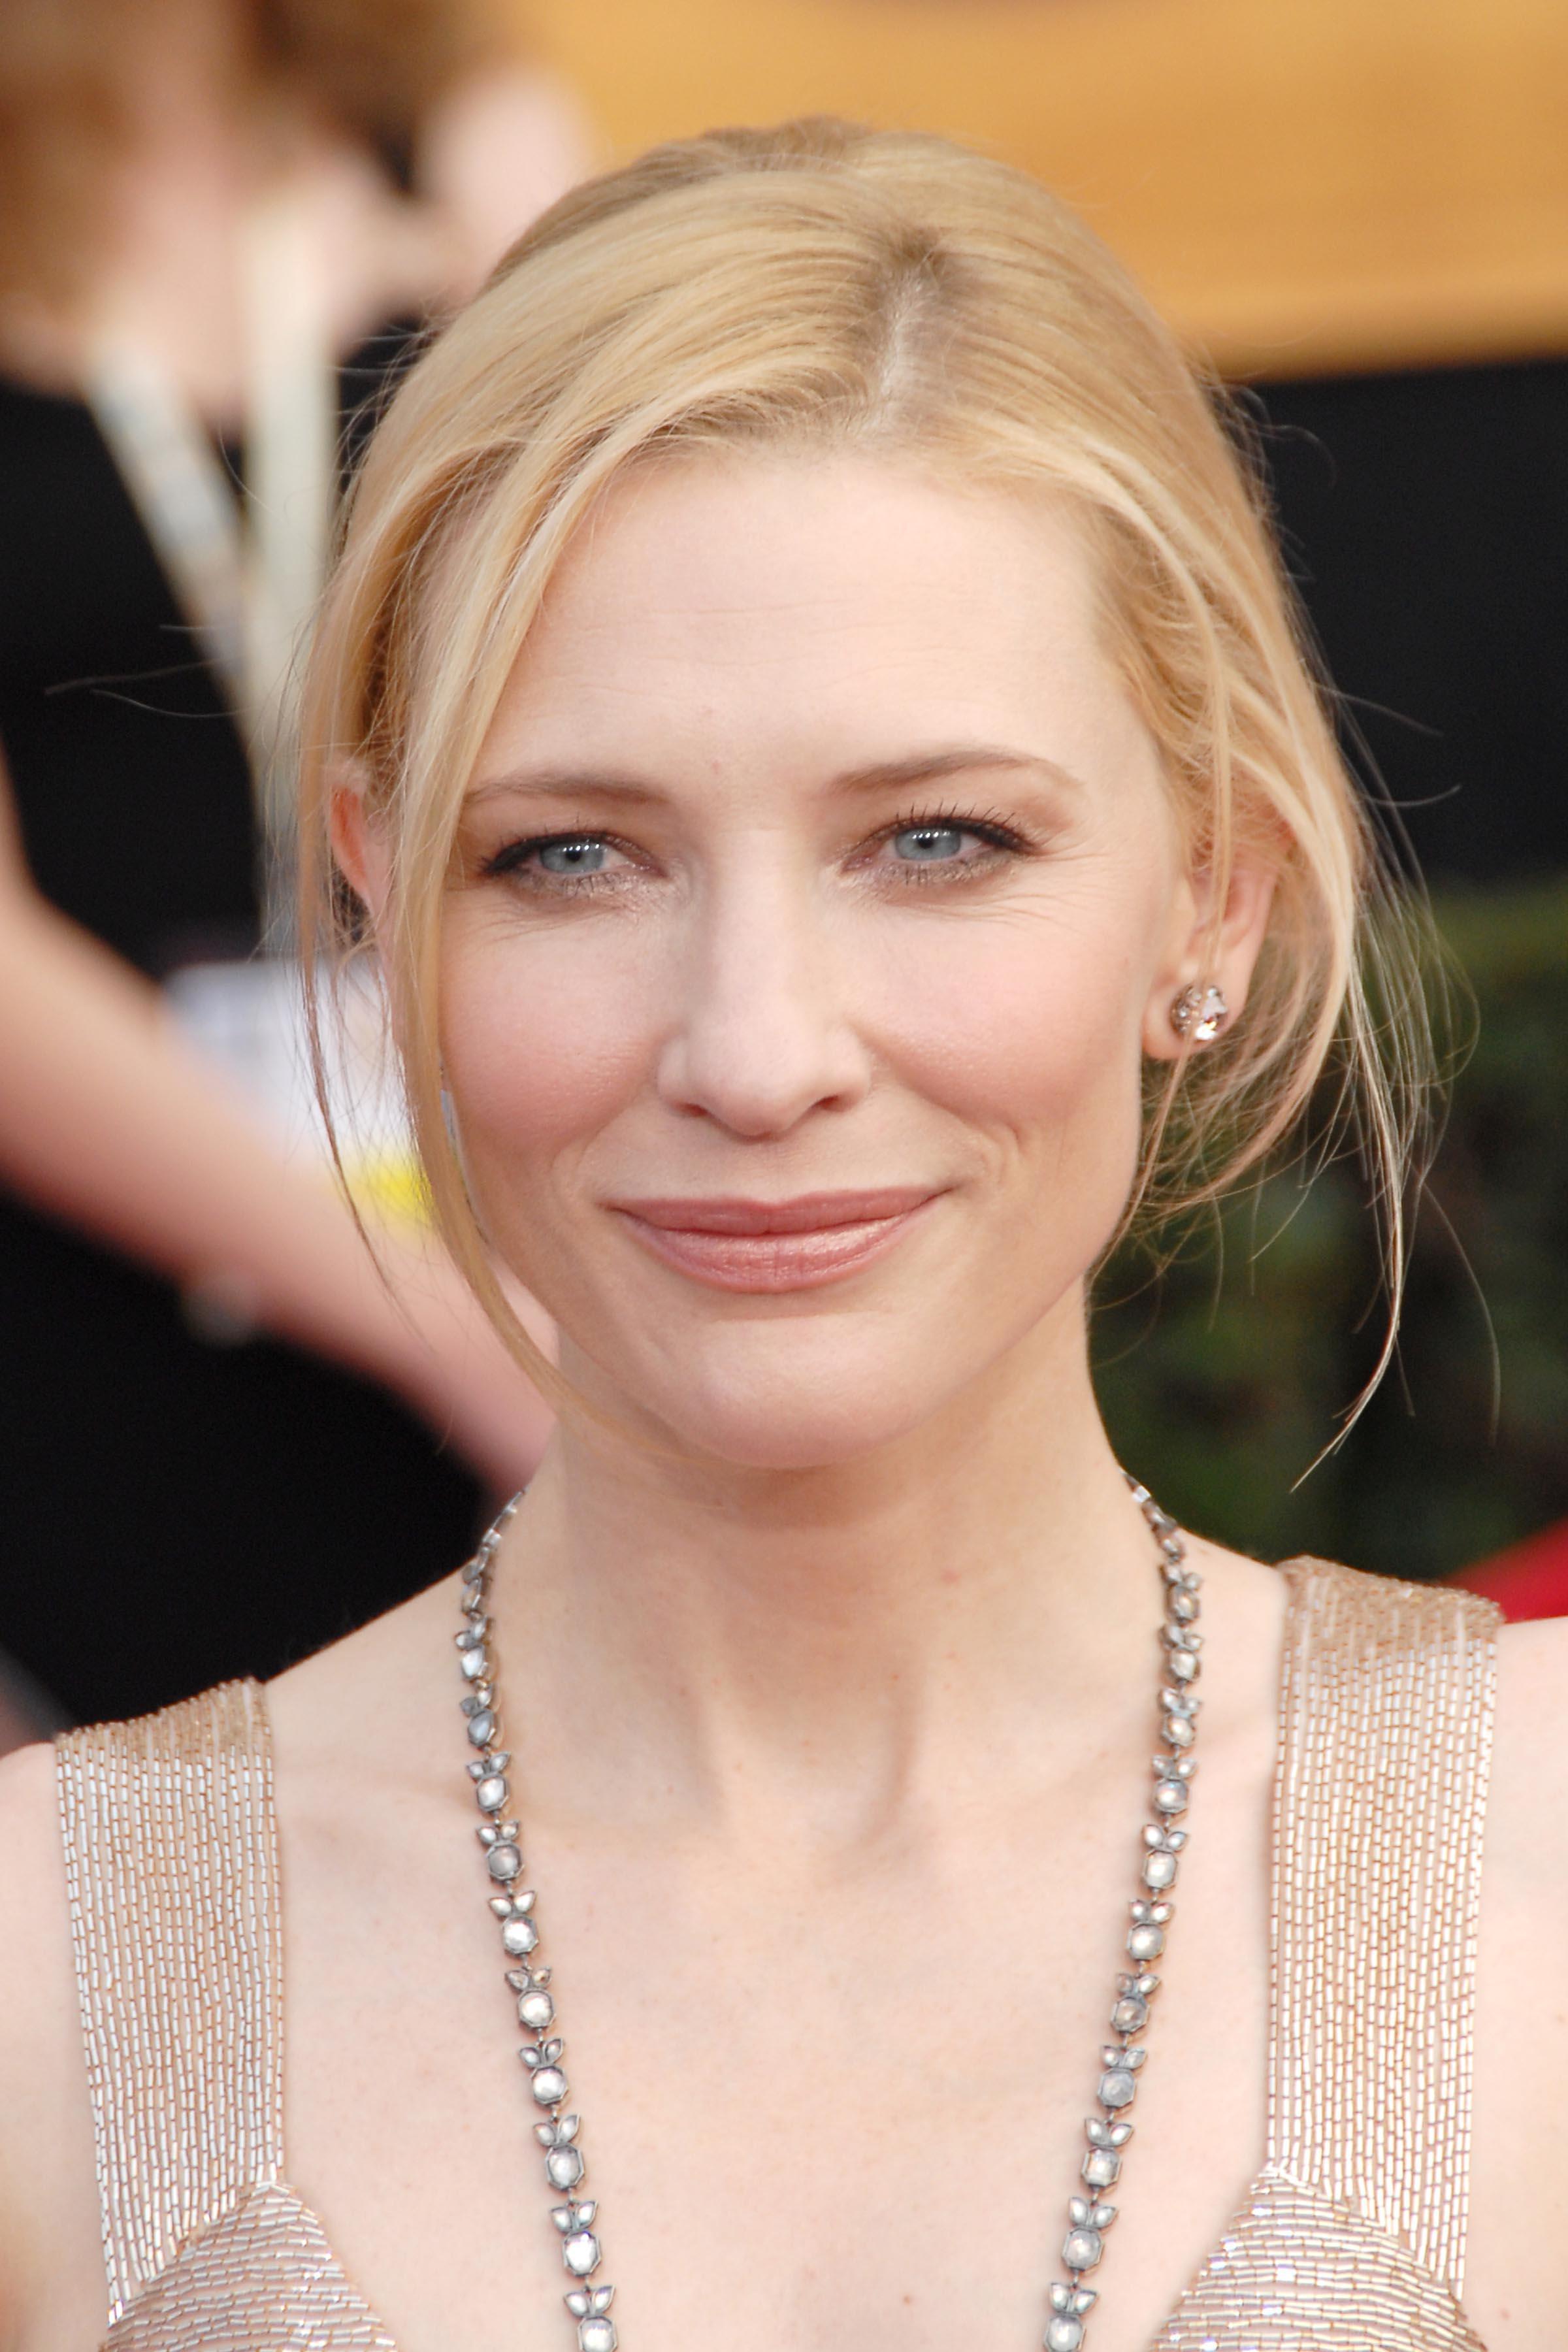 Cate Blanchett Desnuda Página 4 Fotos Desnuda Descuido Topless